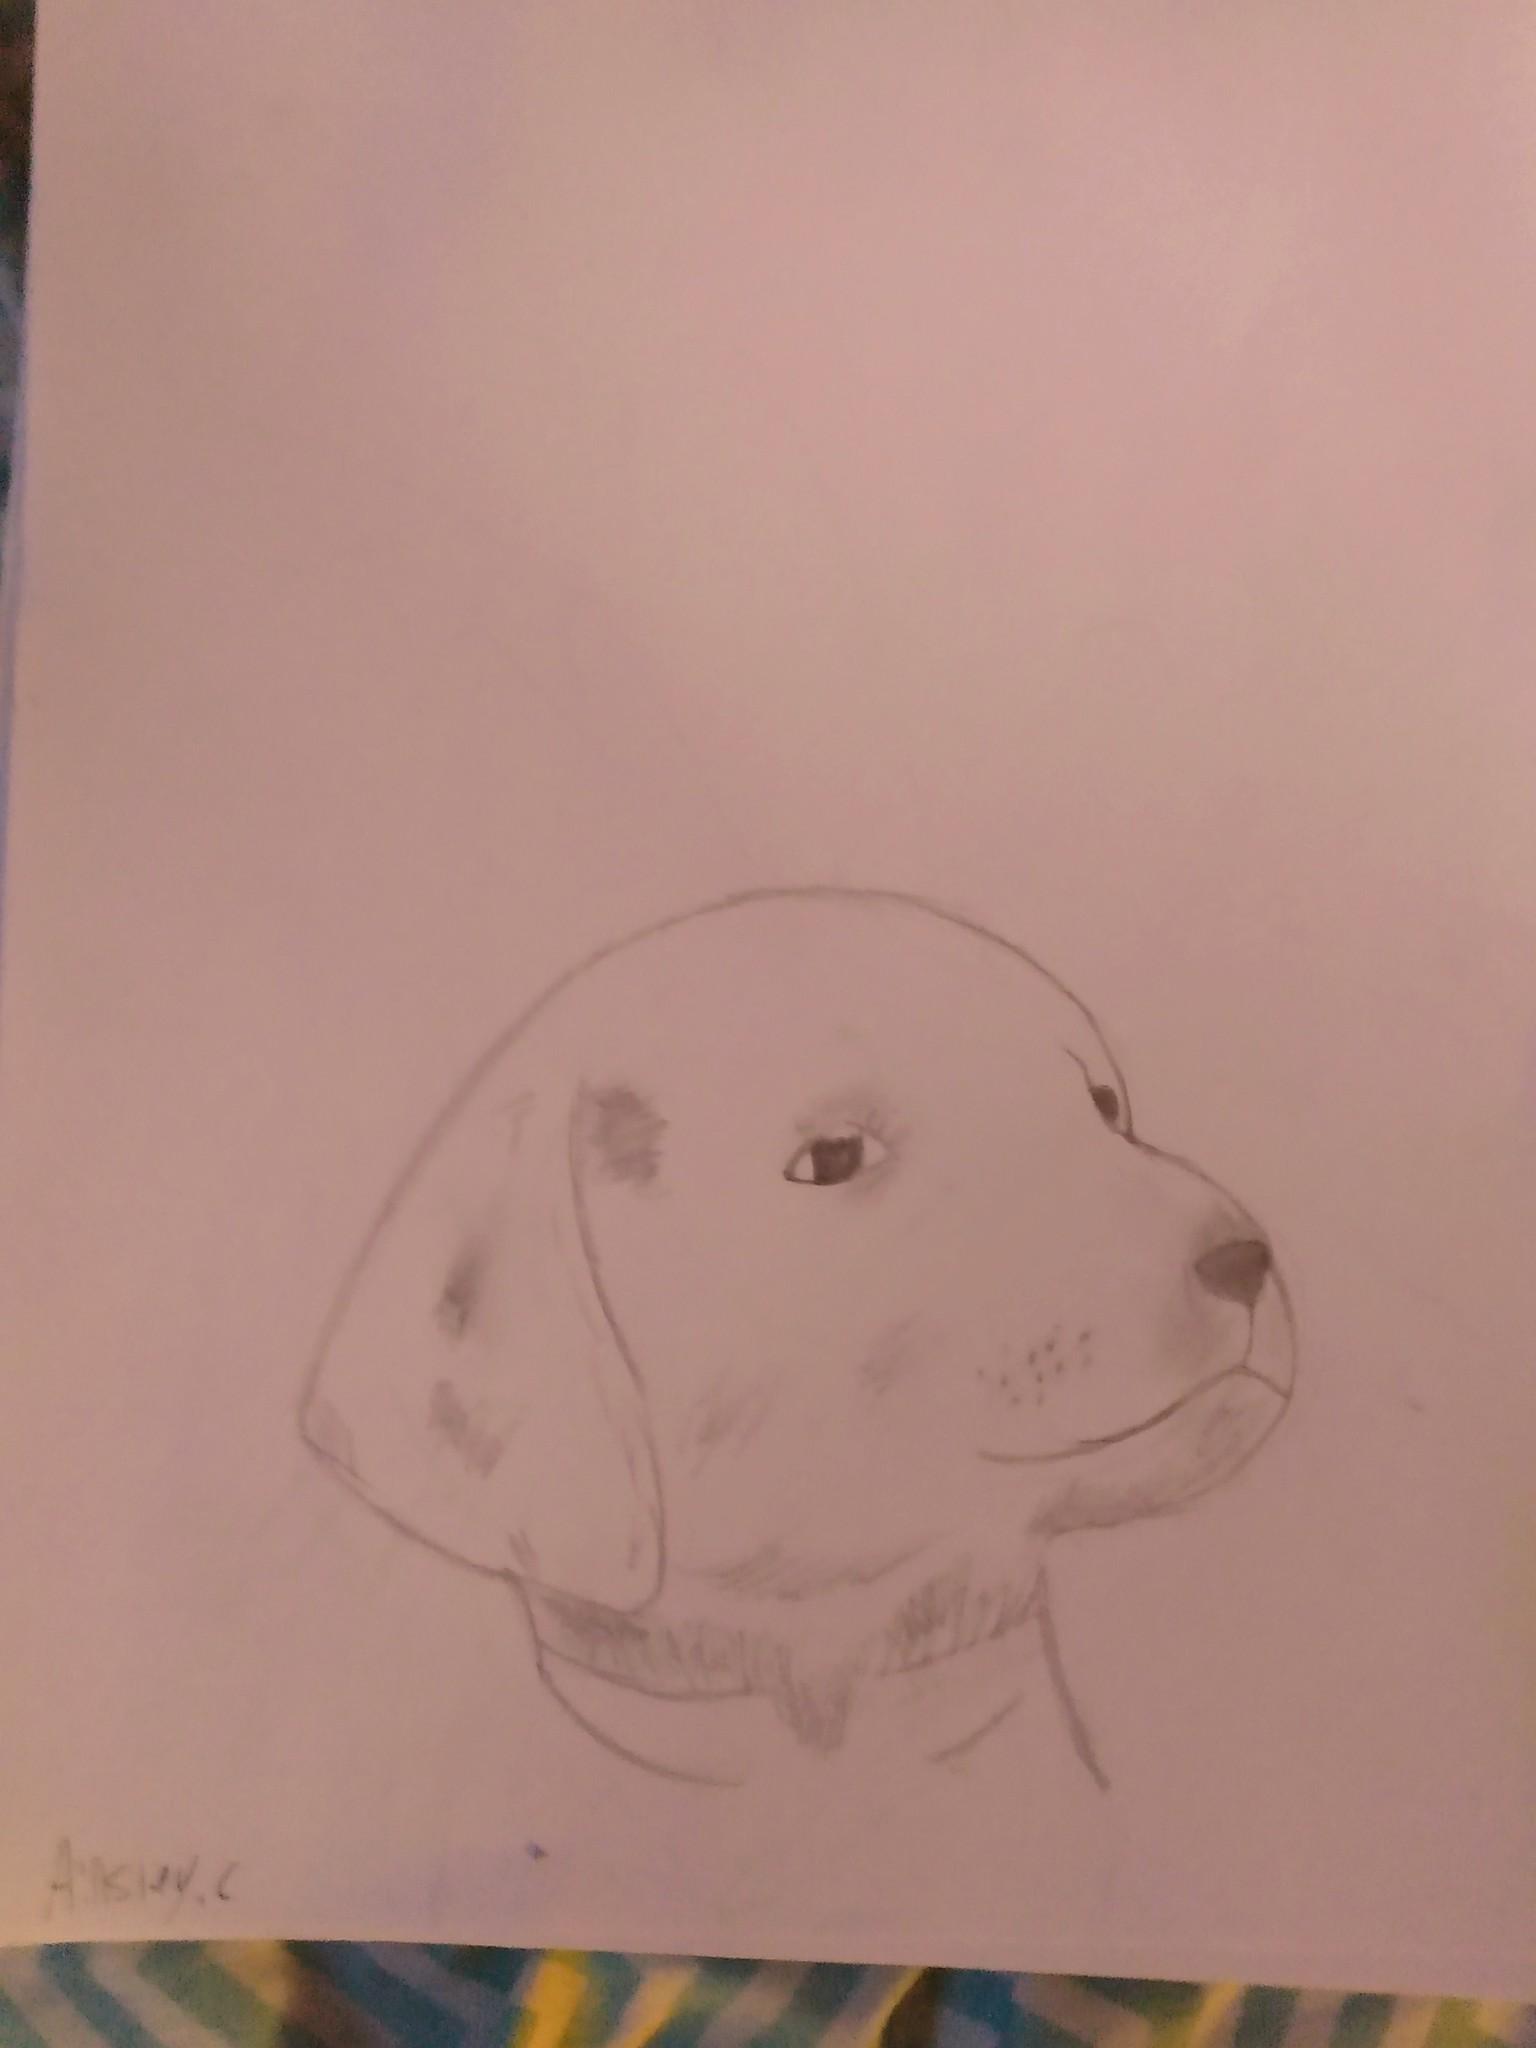 I know it's not a meme but it's cute I drew him myself his name is Chuck